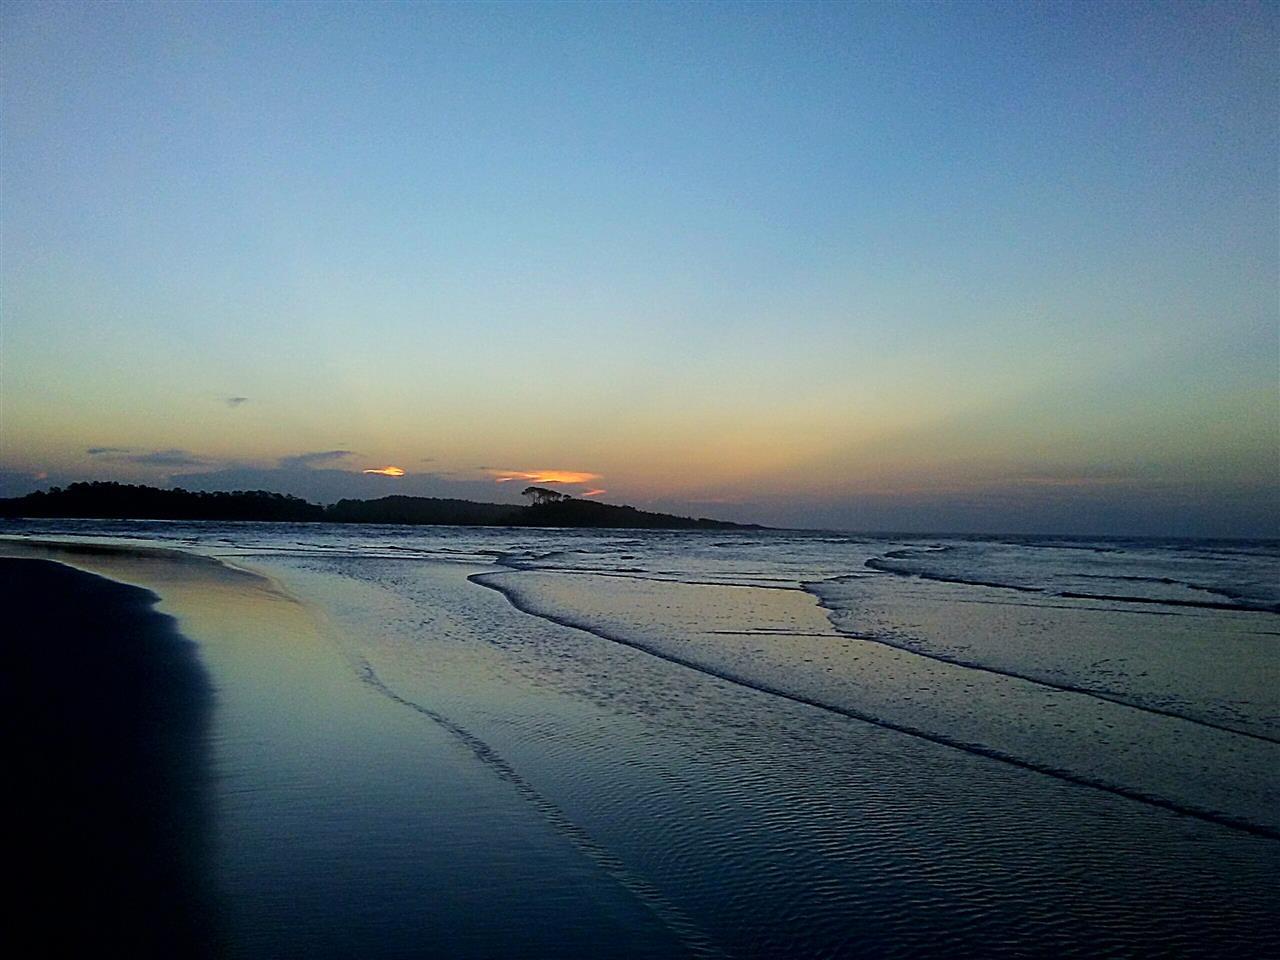 Cherry Grove Beach, North Myrtle Beach, SC